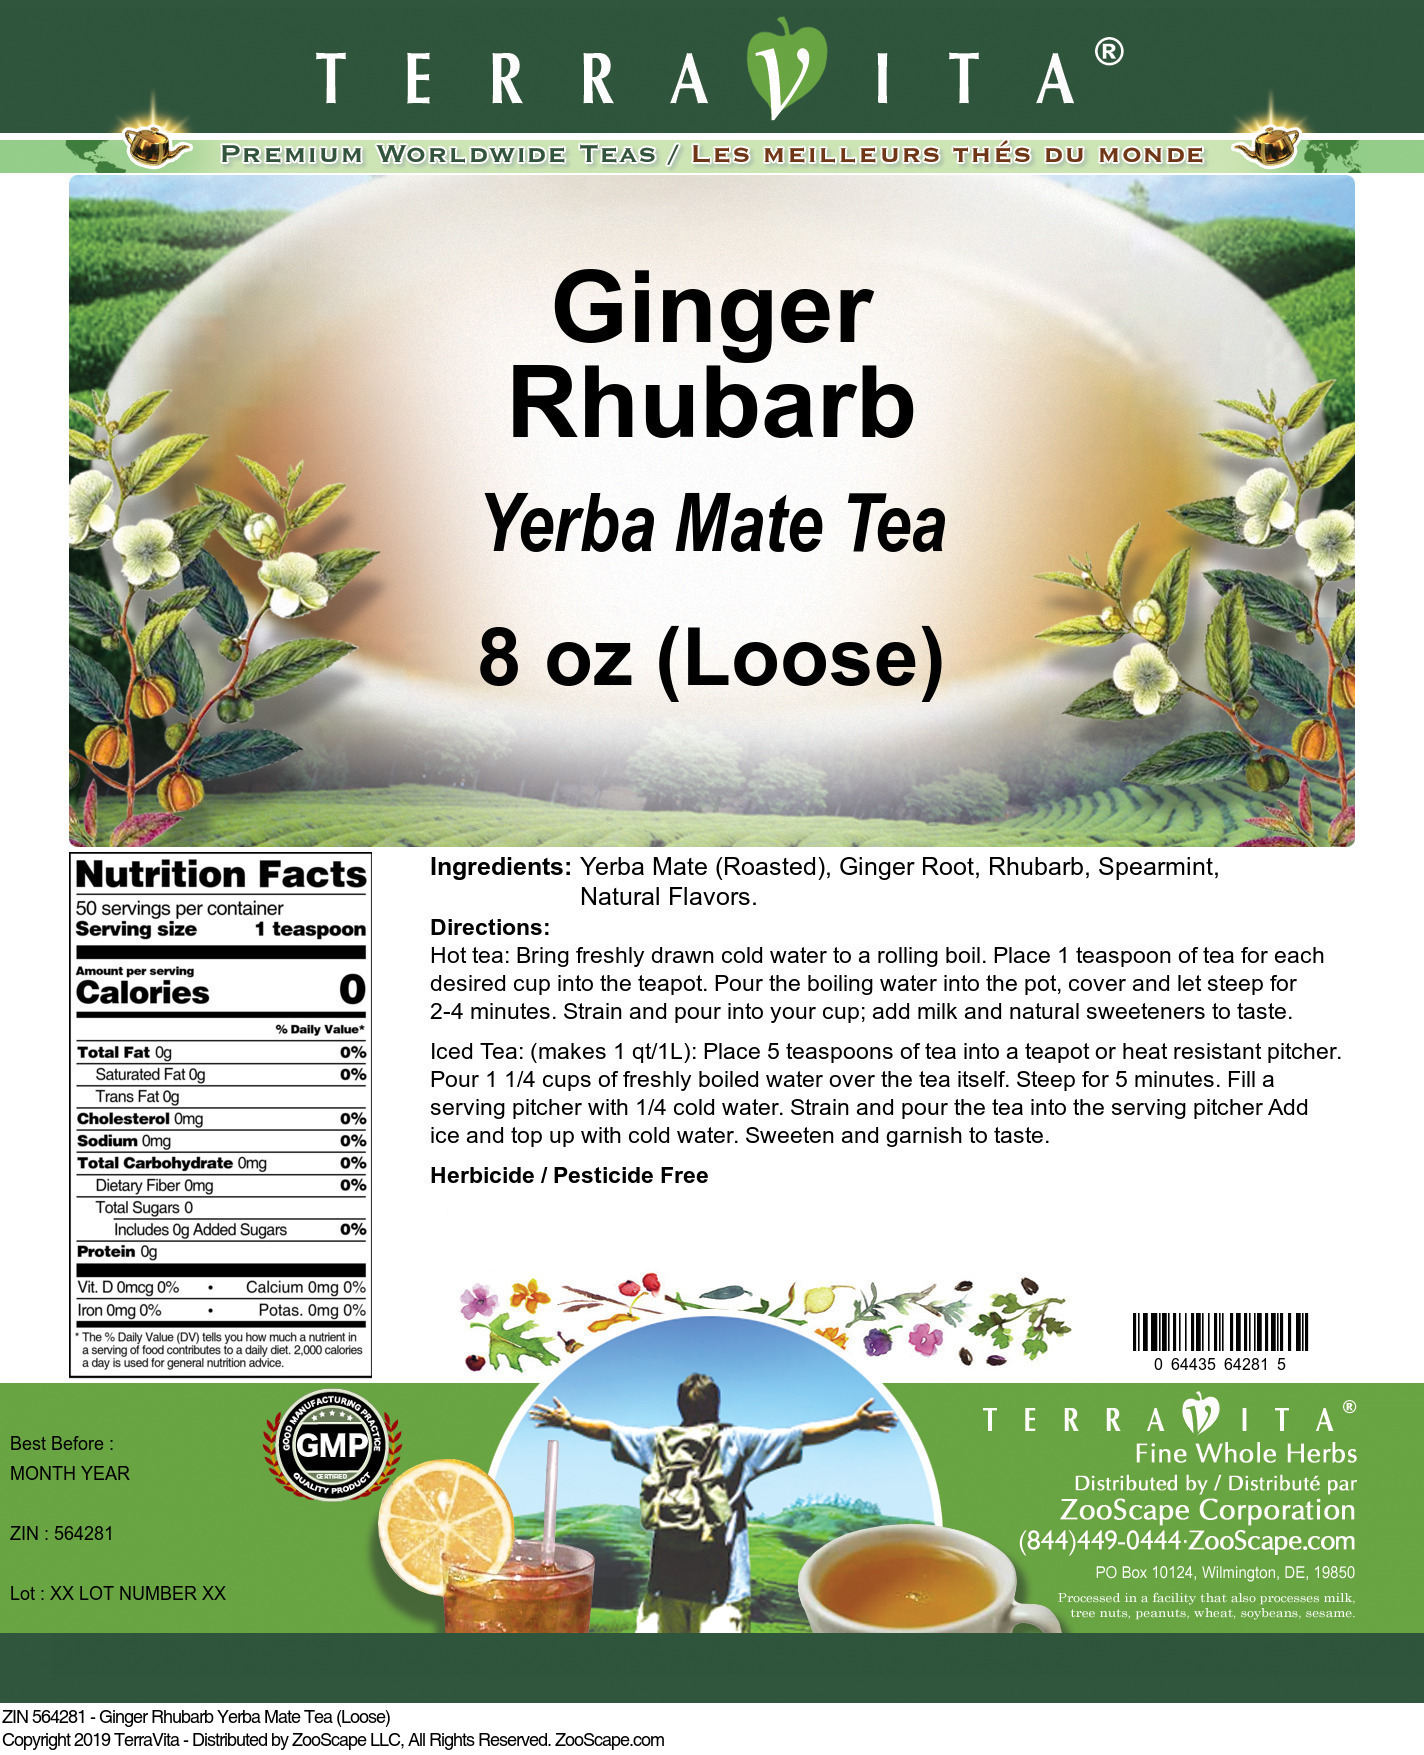 Ginger Rhubarb Yerba Mate